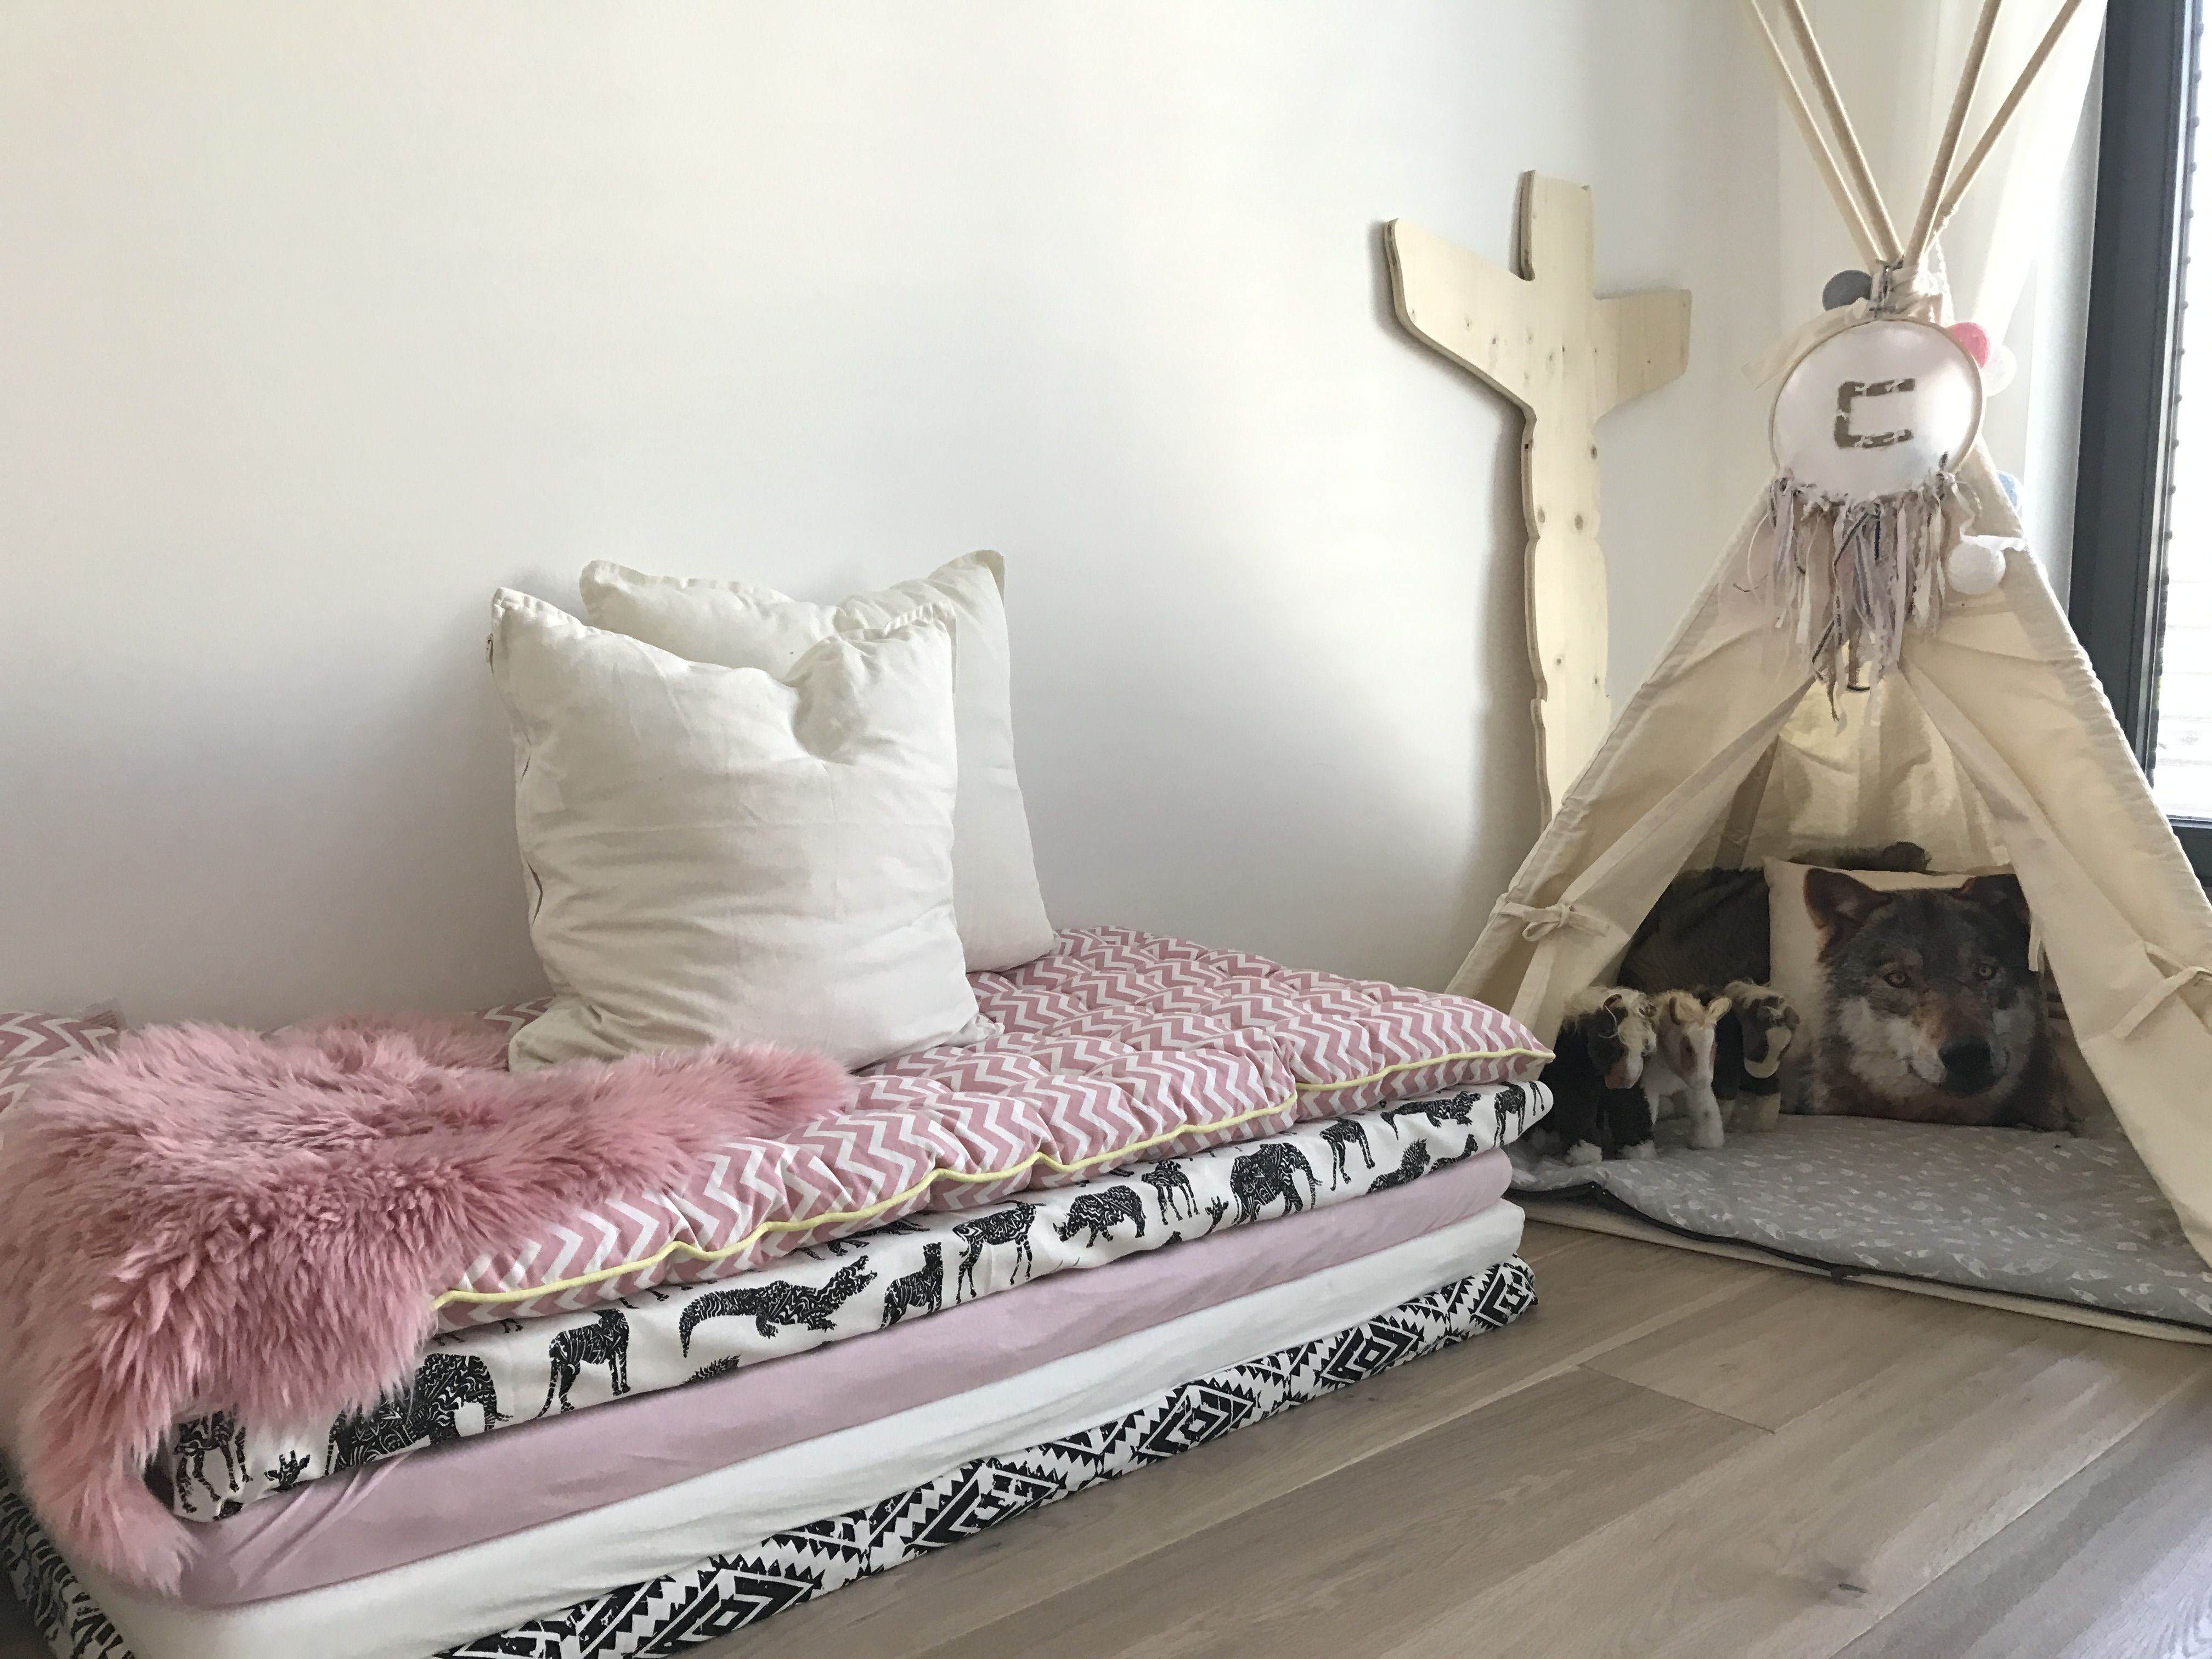 matratzenlager tipi kinderzimmer babygirl baby ikea matratze vertbaudet matratzenlager. Black Bedroom Furniture Sets. Home Design Ideas